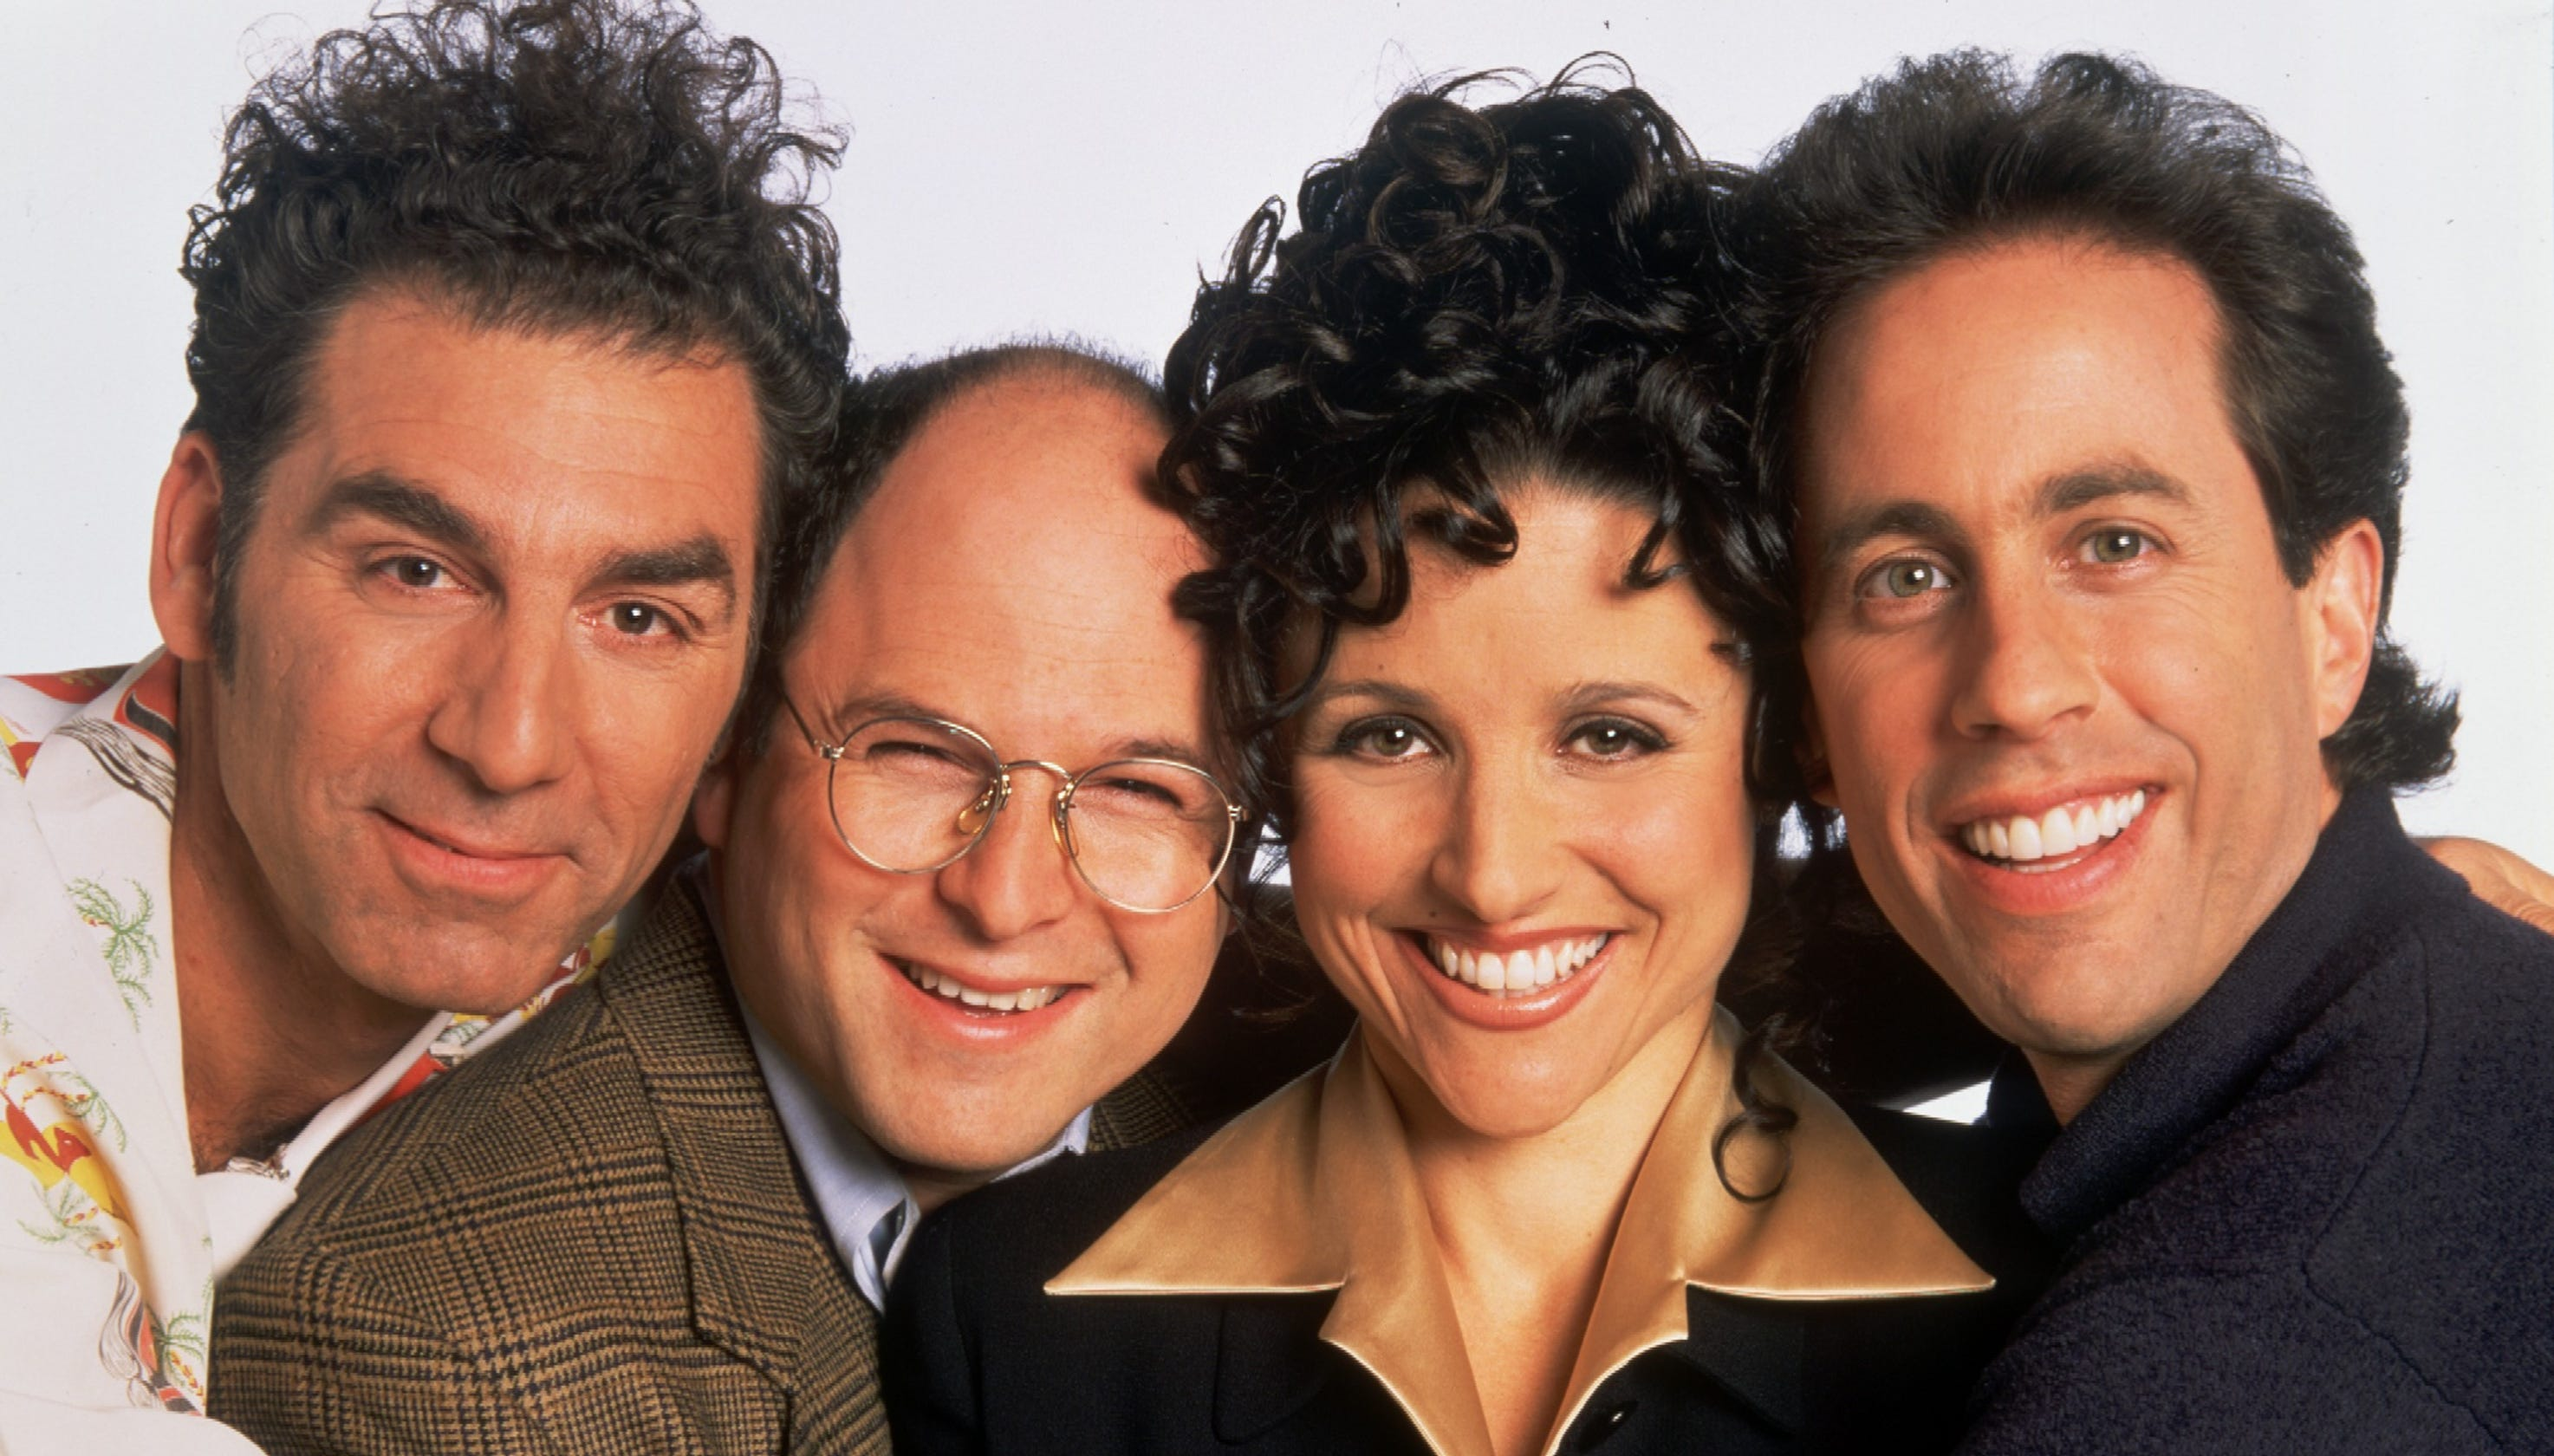 Hola Seinfeld, chau Friends - Radio Cantilo